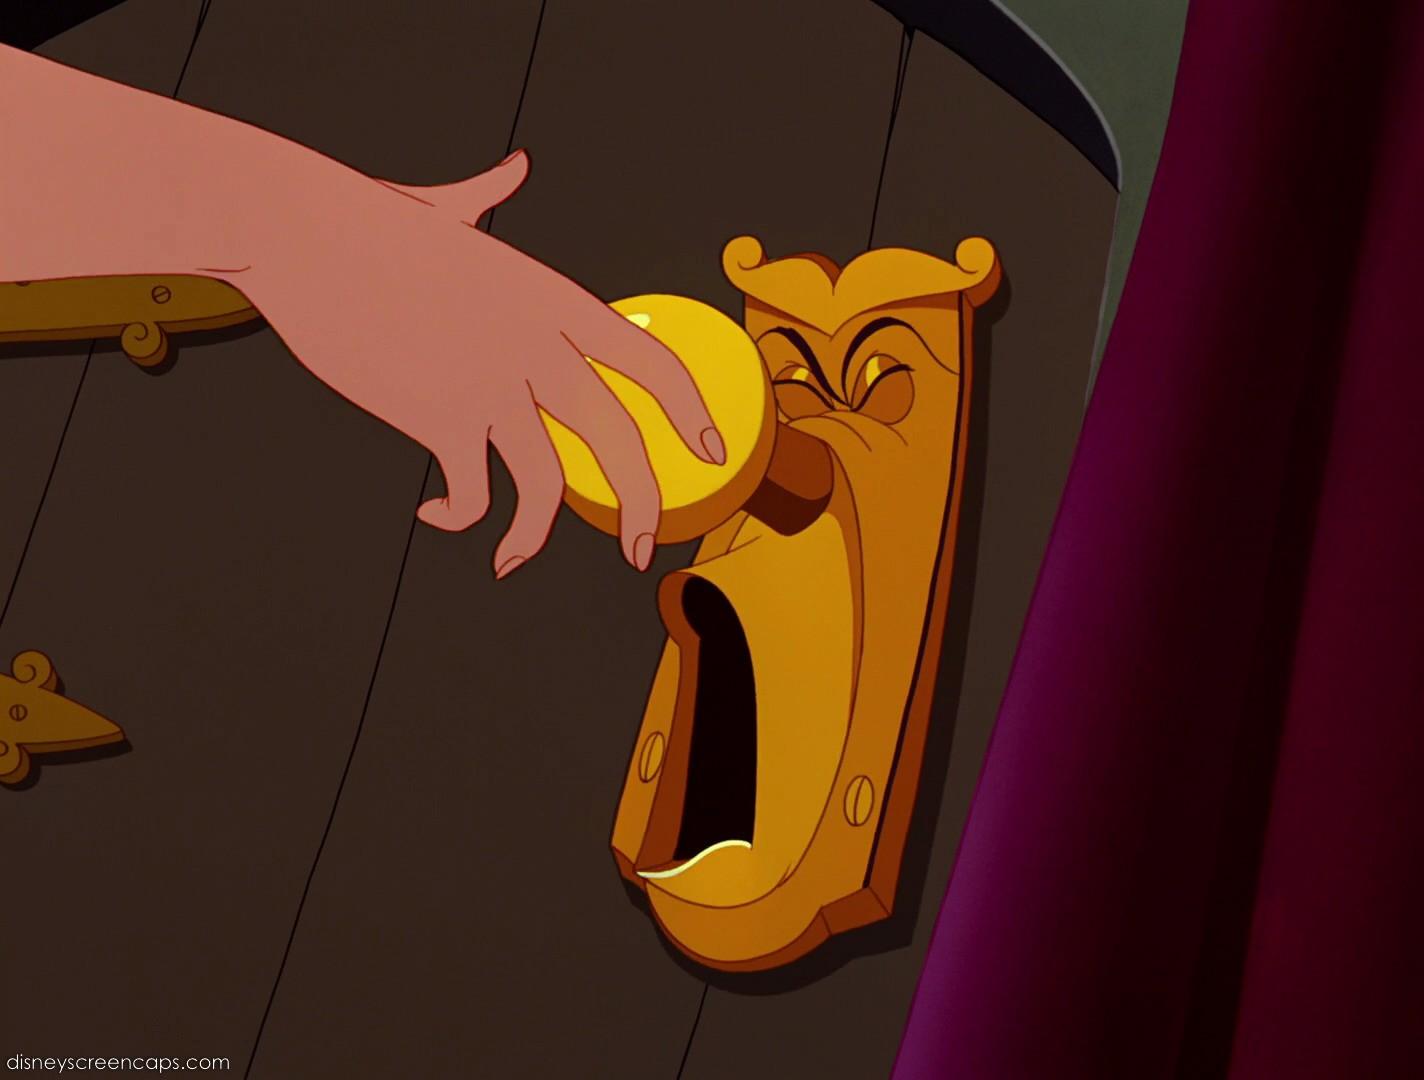 & Doorknob | Alice in Wonderland Wiki | FANDOM powered by Wikia